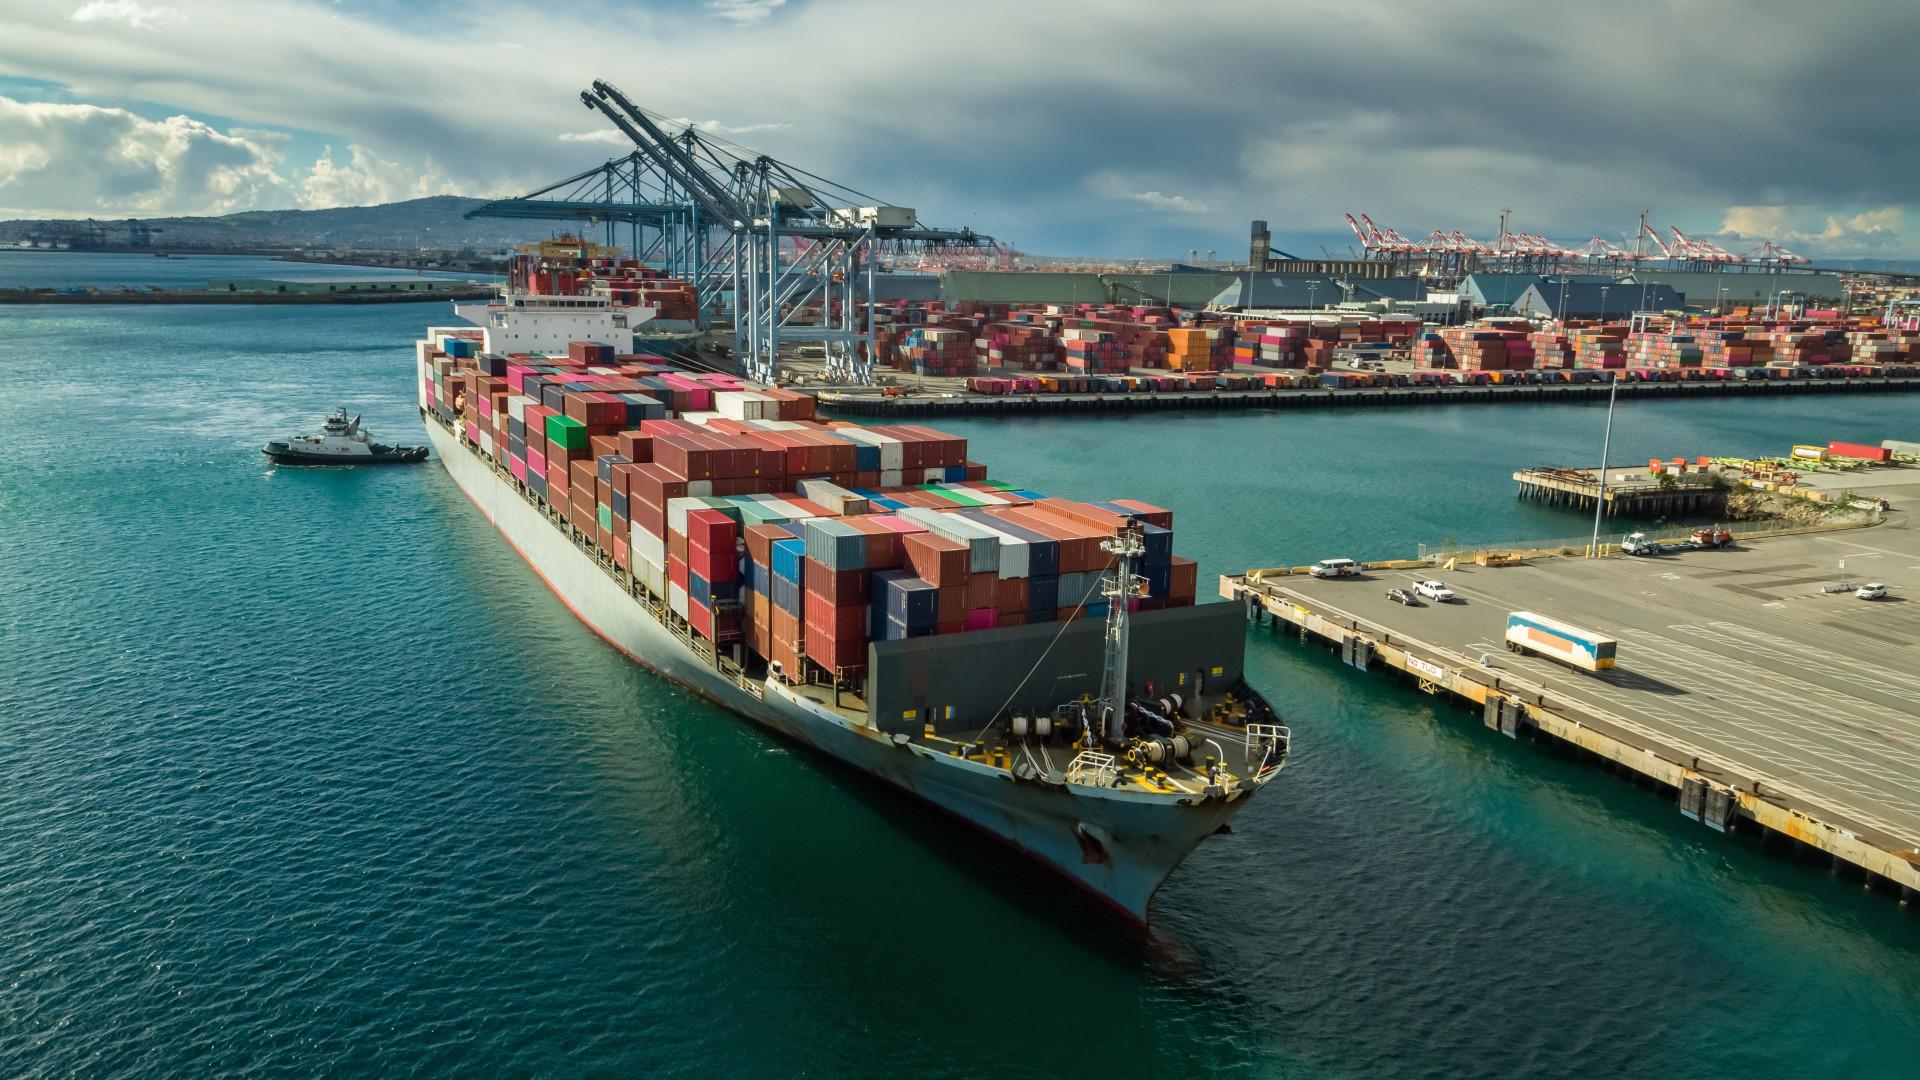 globális kereskedelem dolgoprudny)